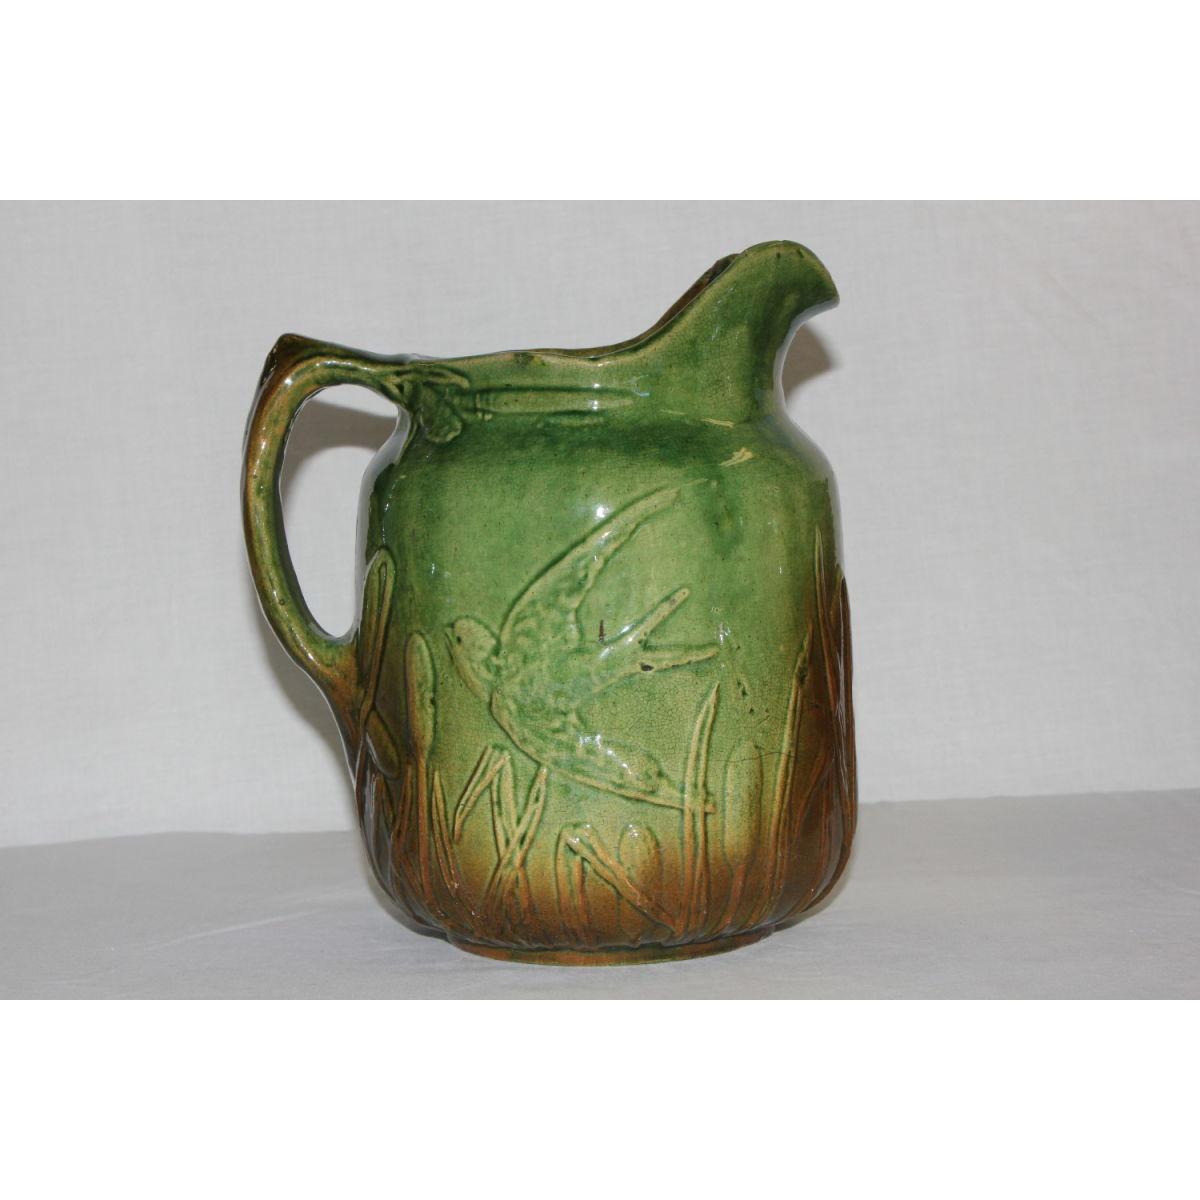 A Favorite! Green-Glazed Yellowware Swallow Pitcher